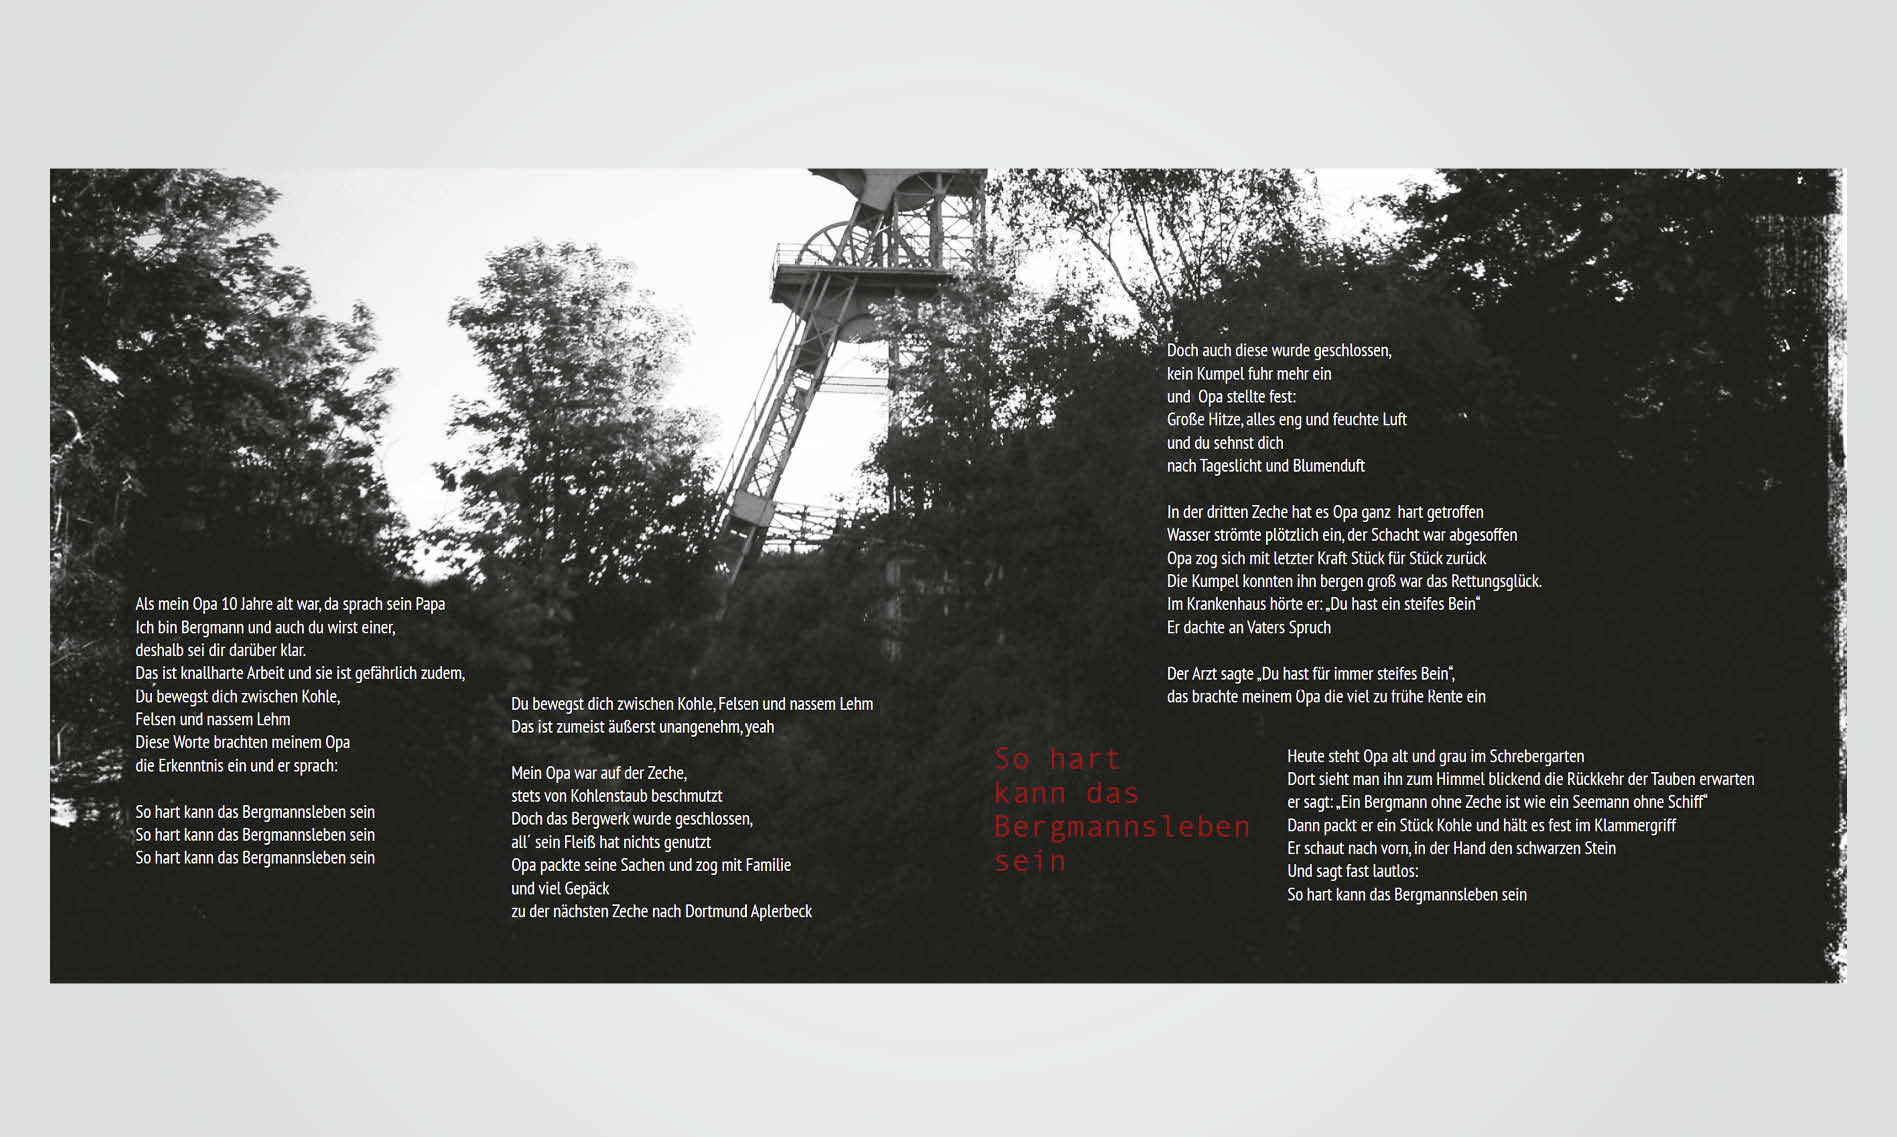 corporate-design-schigulski-musik-12.jpg